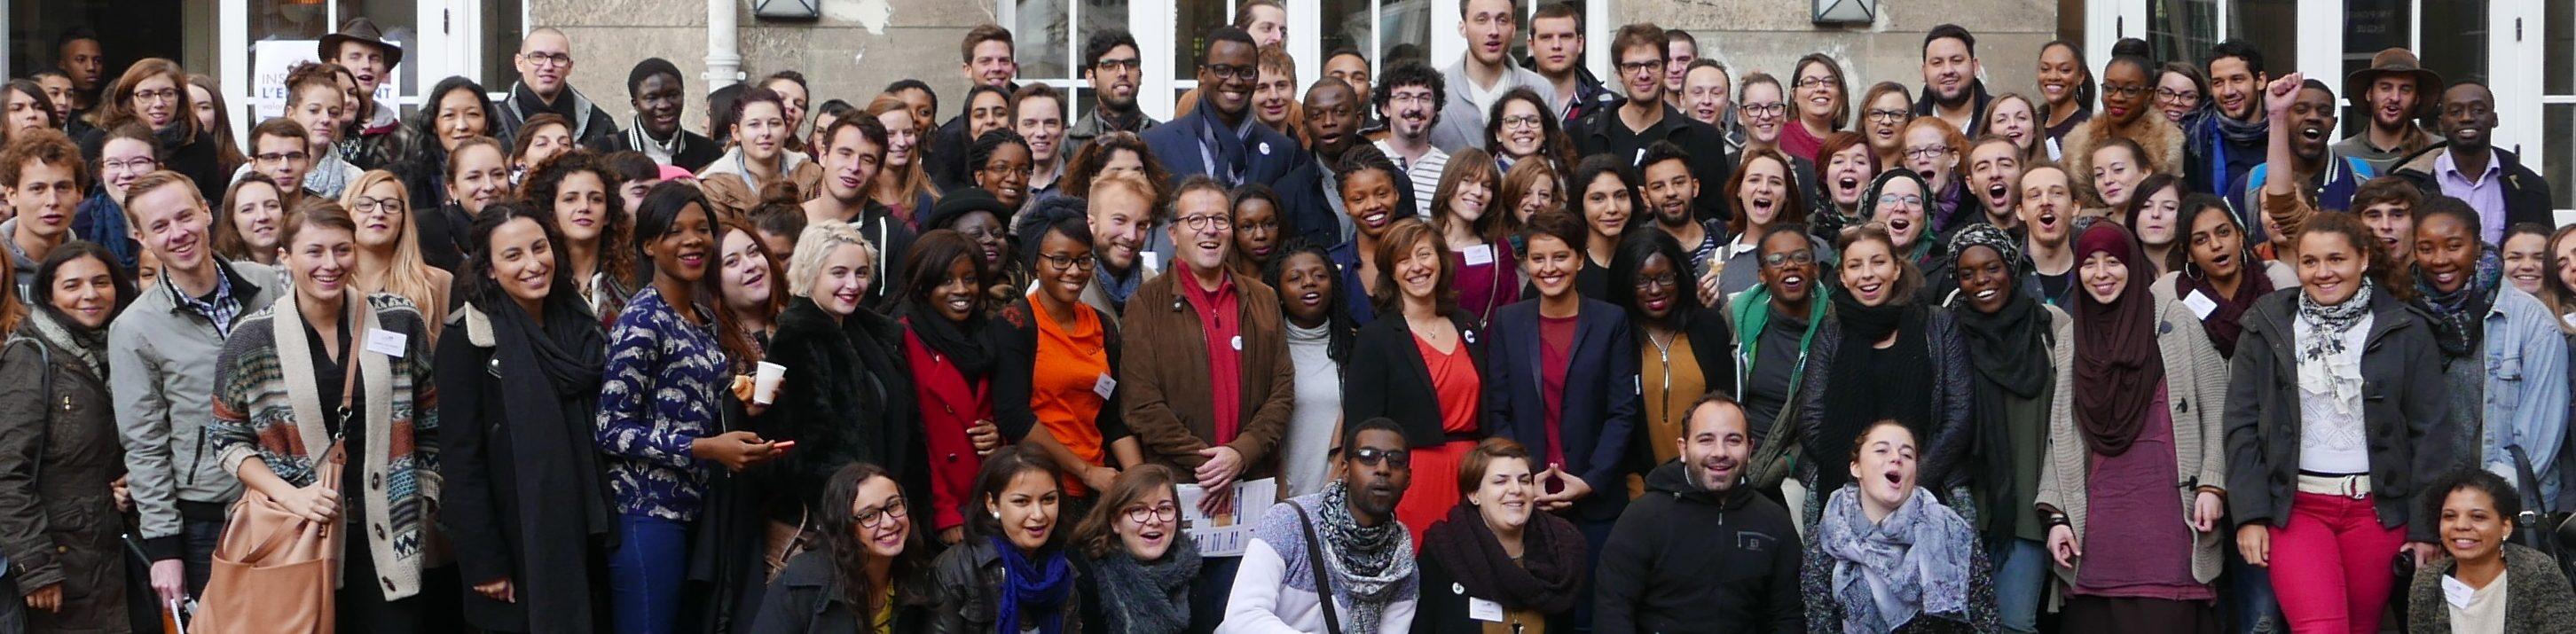 Les laureats devant ESCP Europe